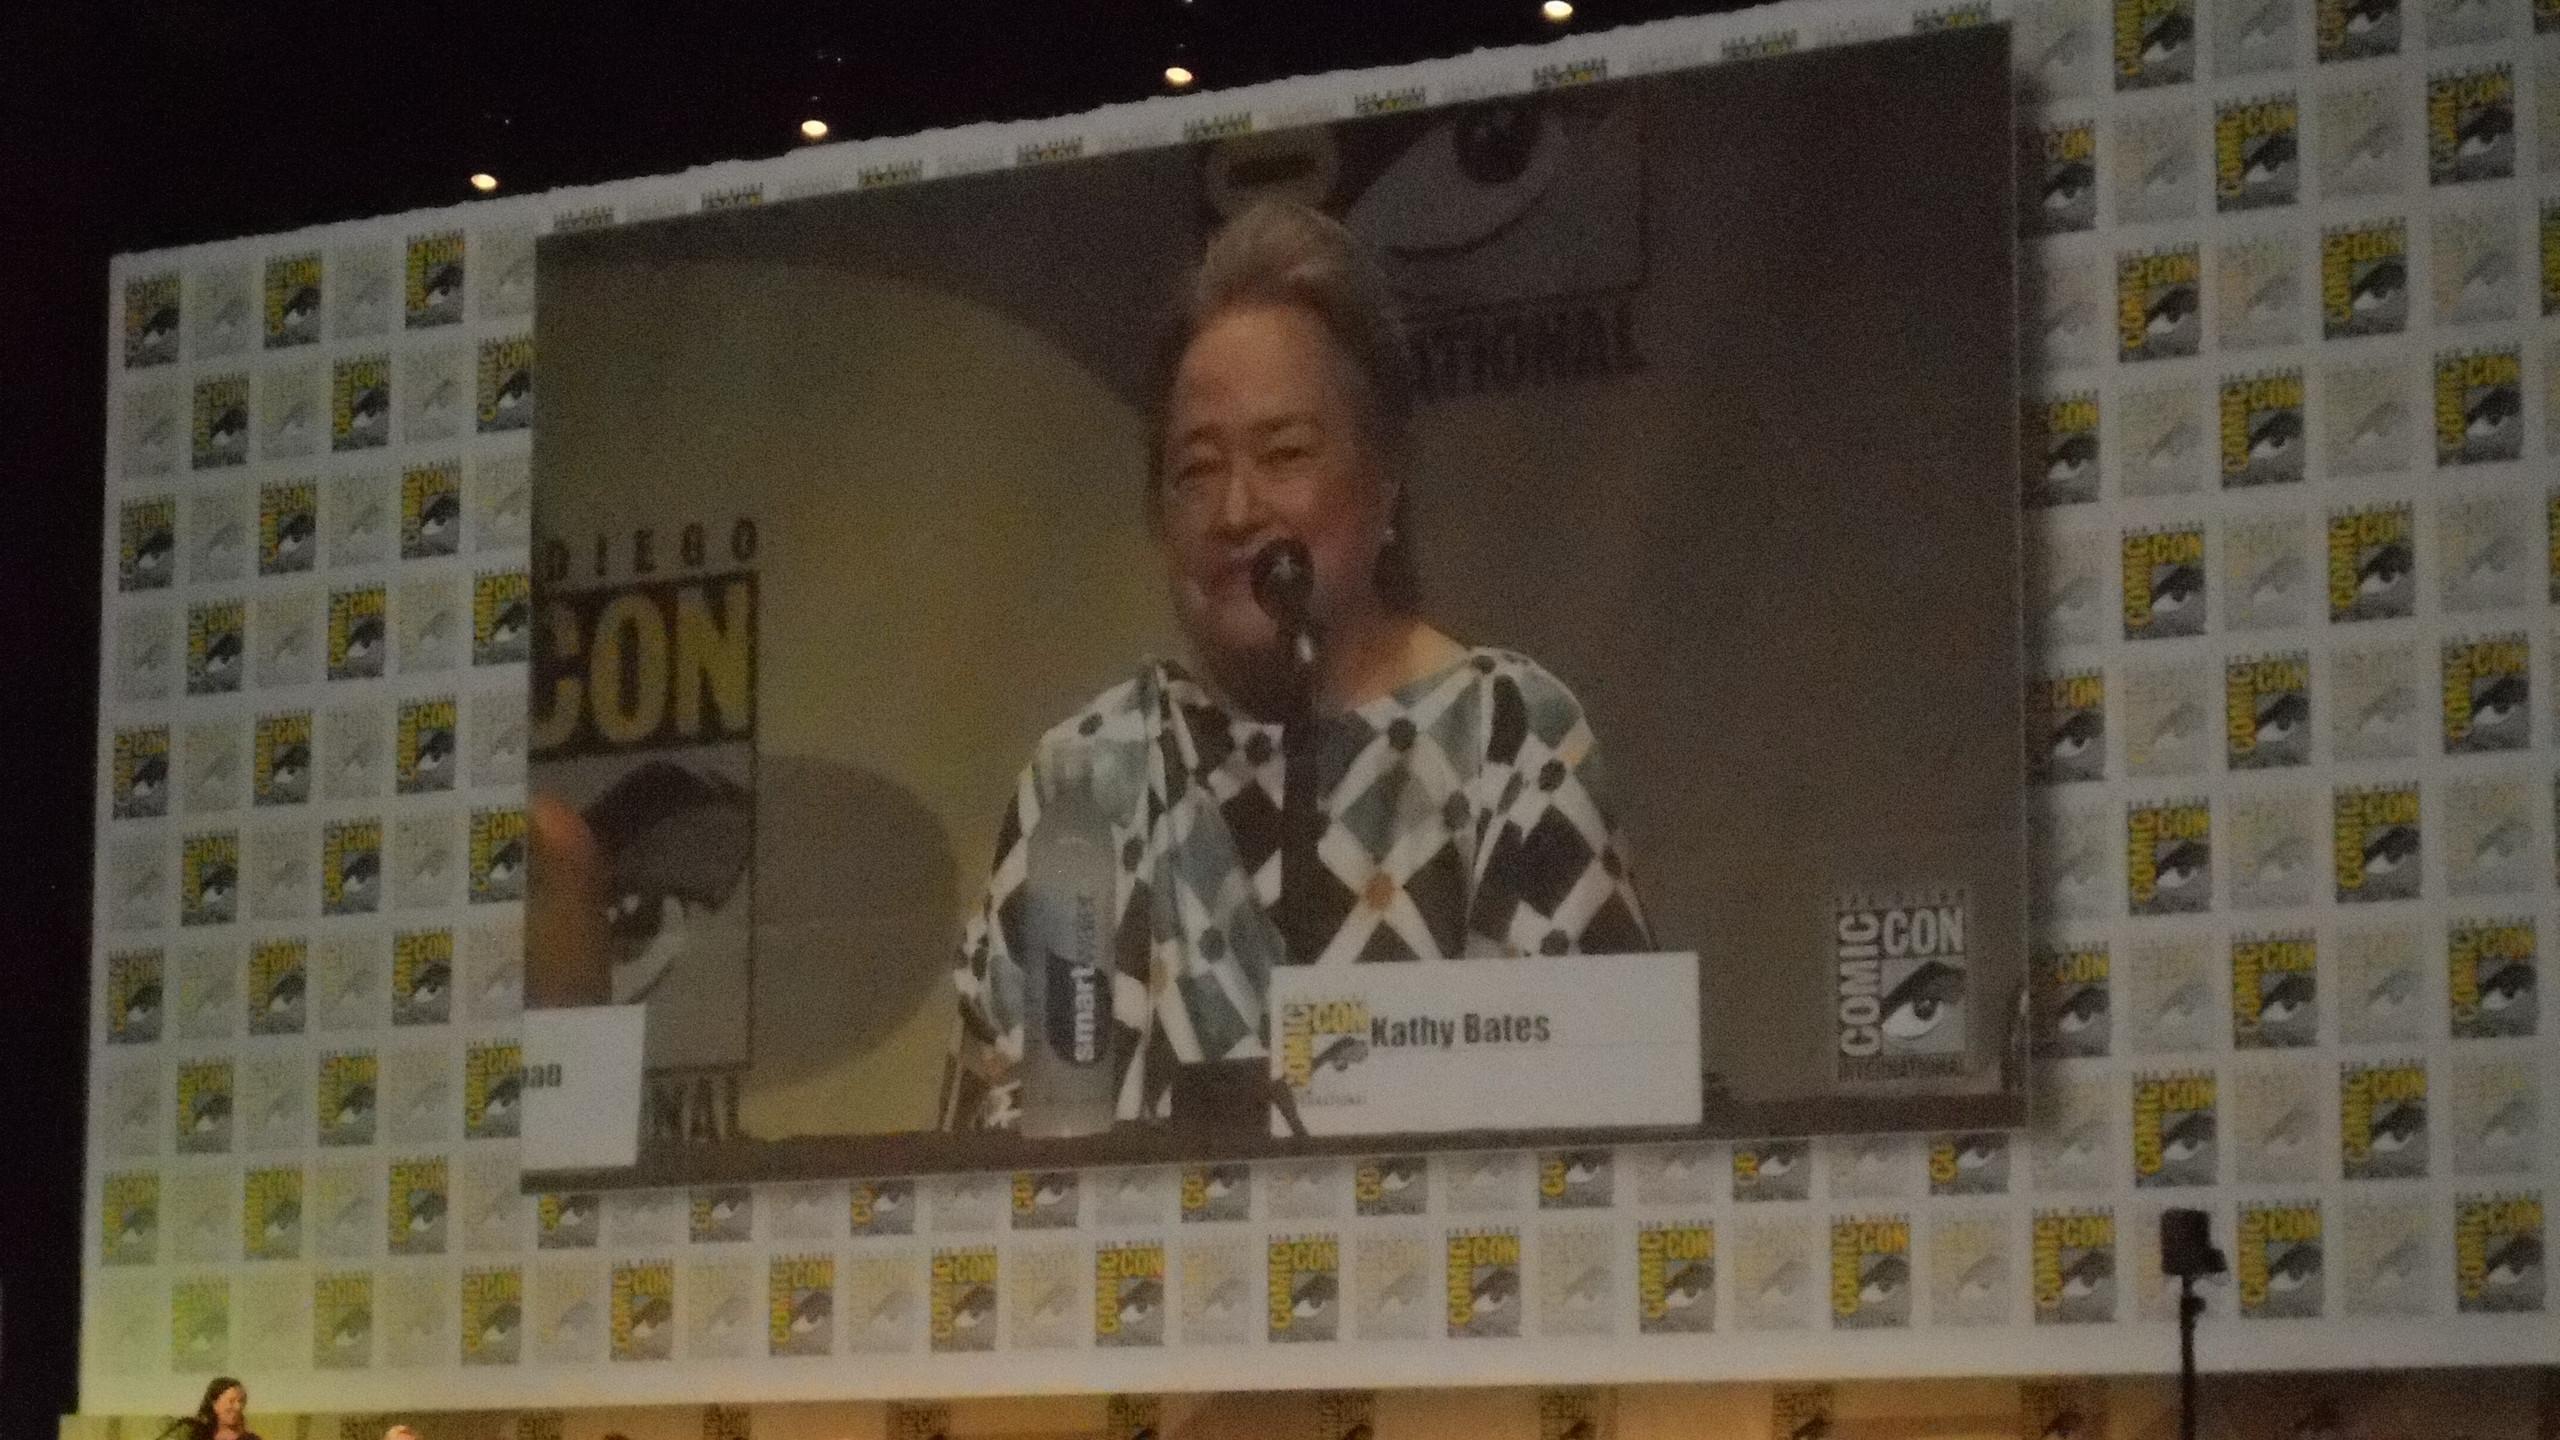 San Diego, Comic-Con, convention, SDCC, Kathy Bates